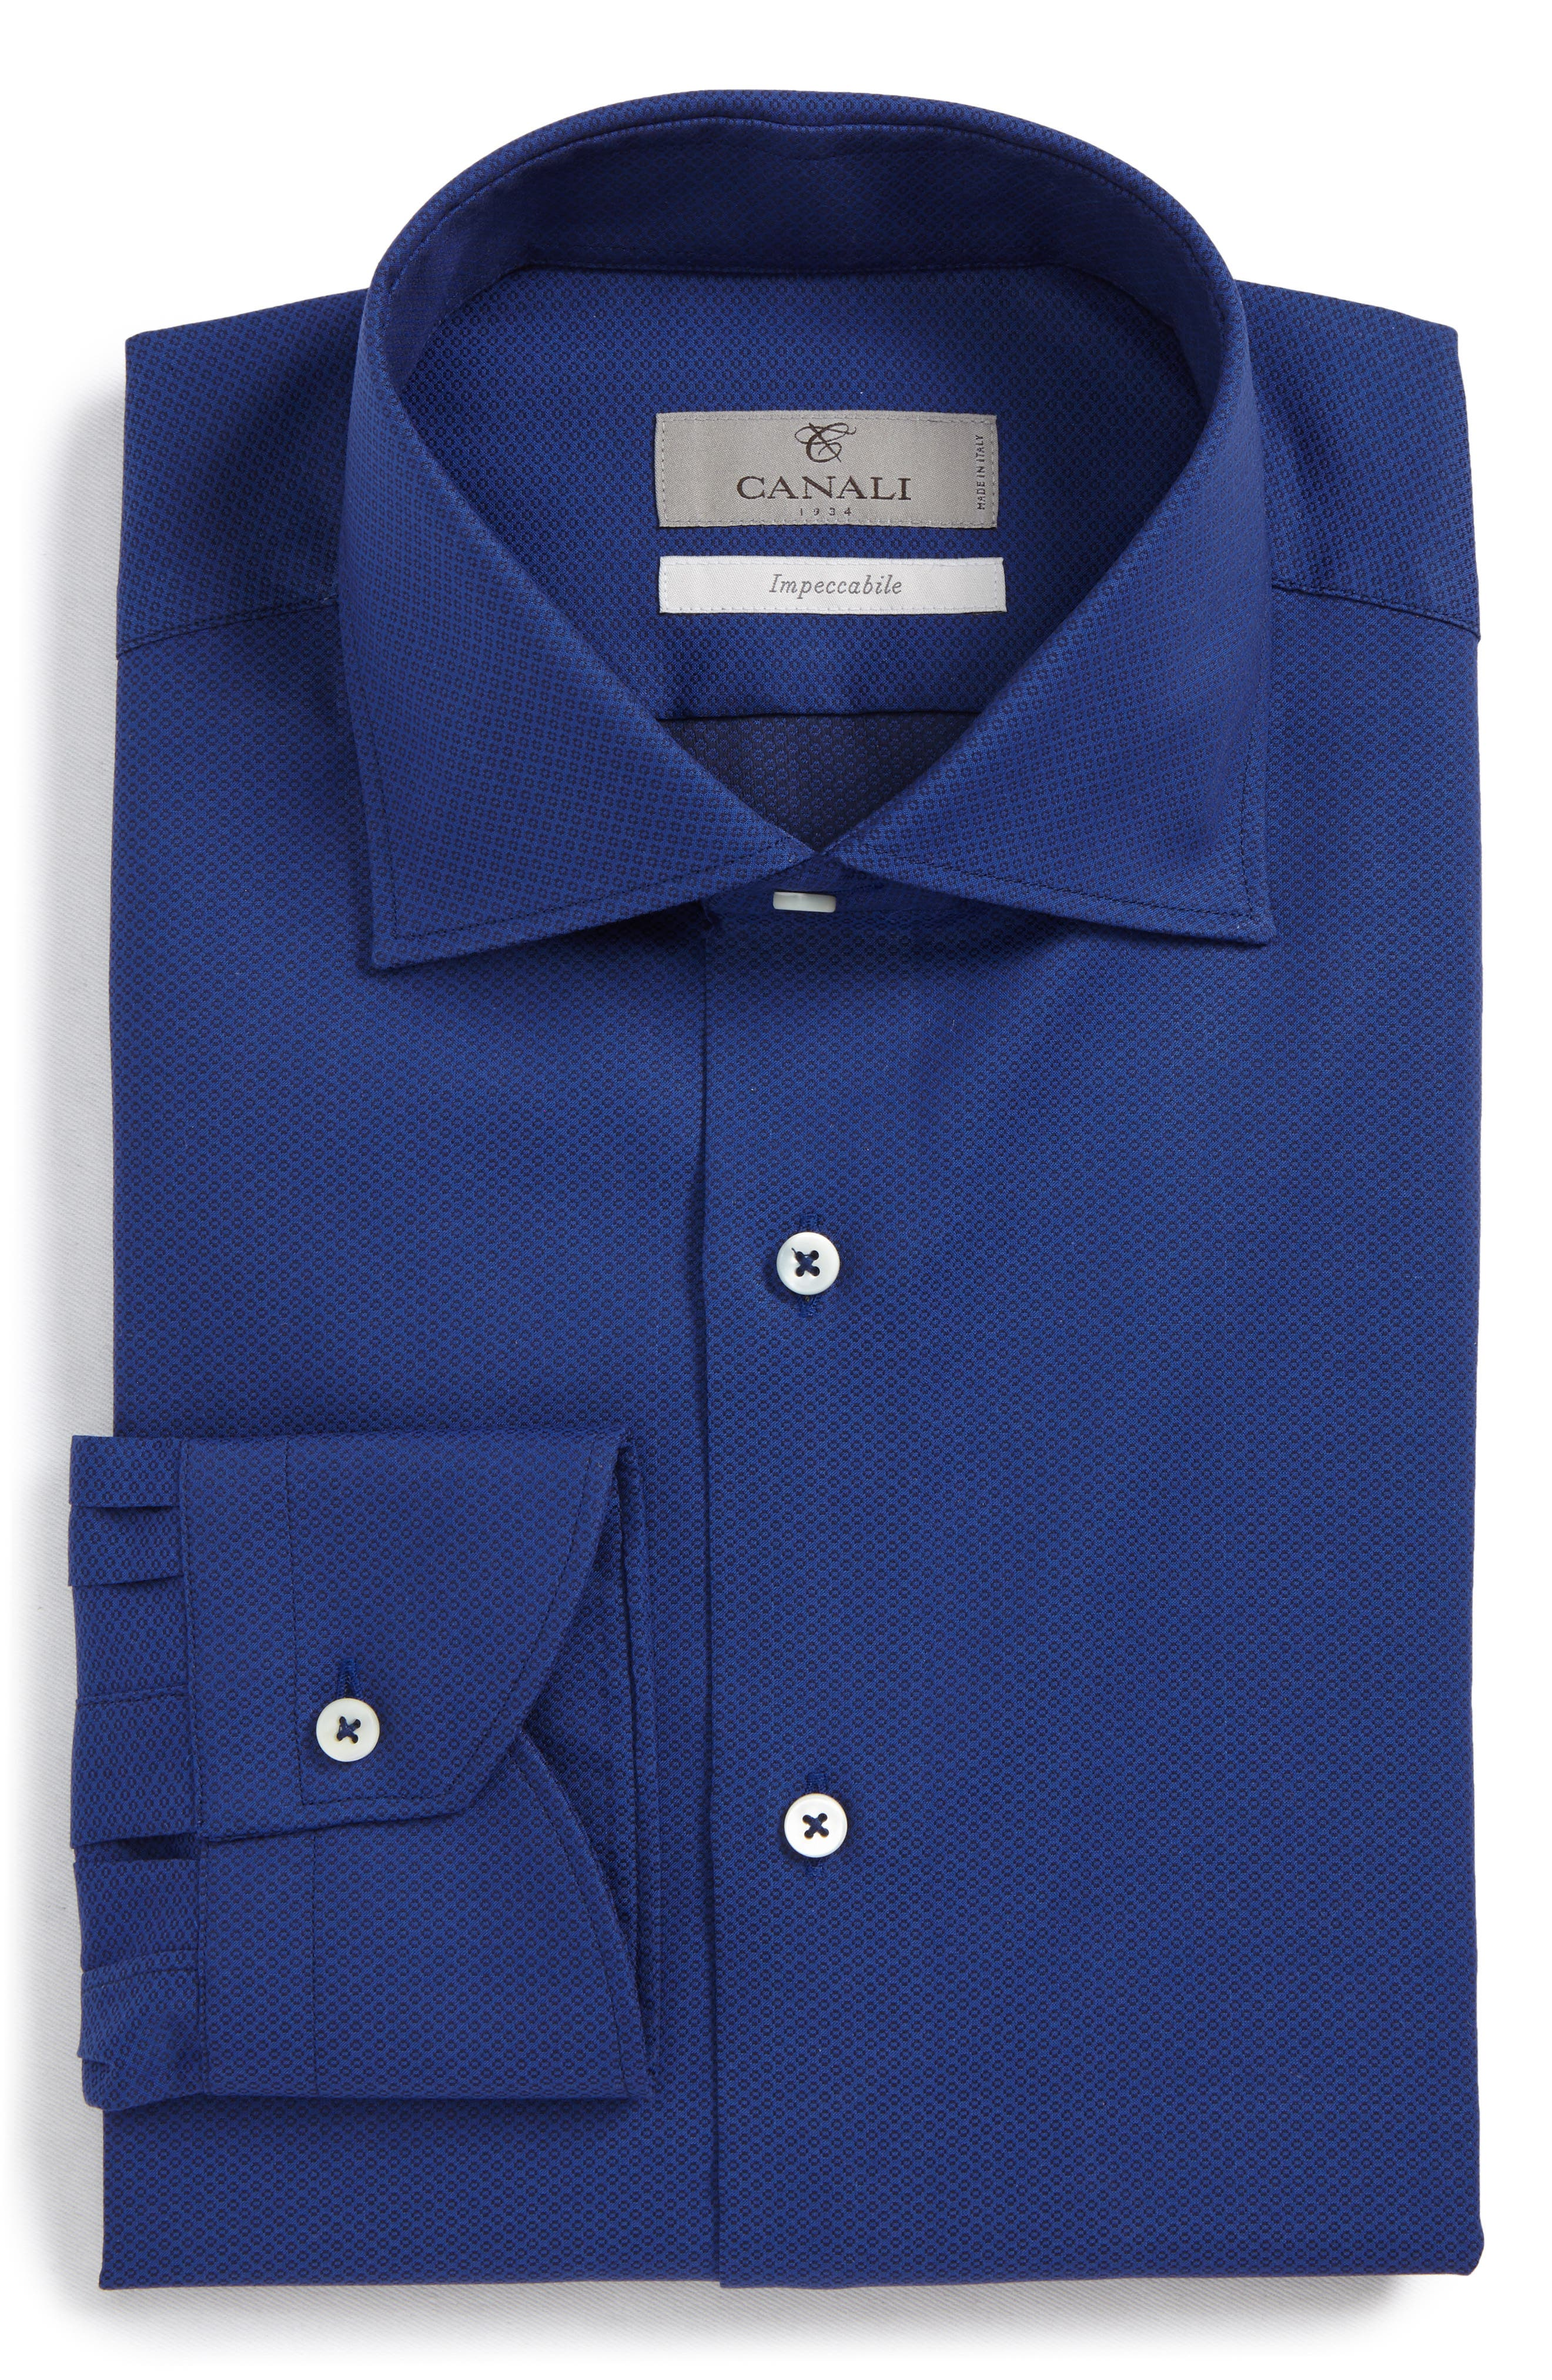 Regular Fit Geometric Dress Shirt,                         Main,                         color, Dark Blue